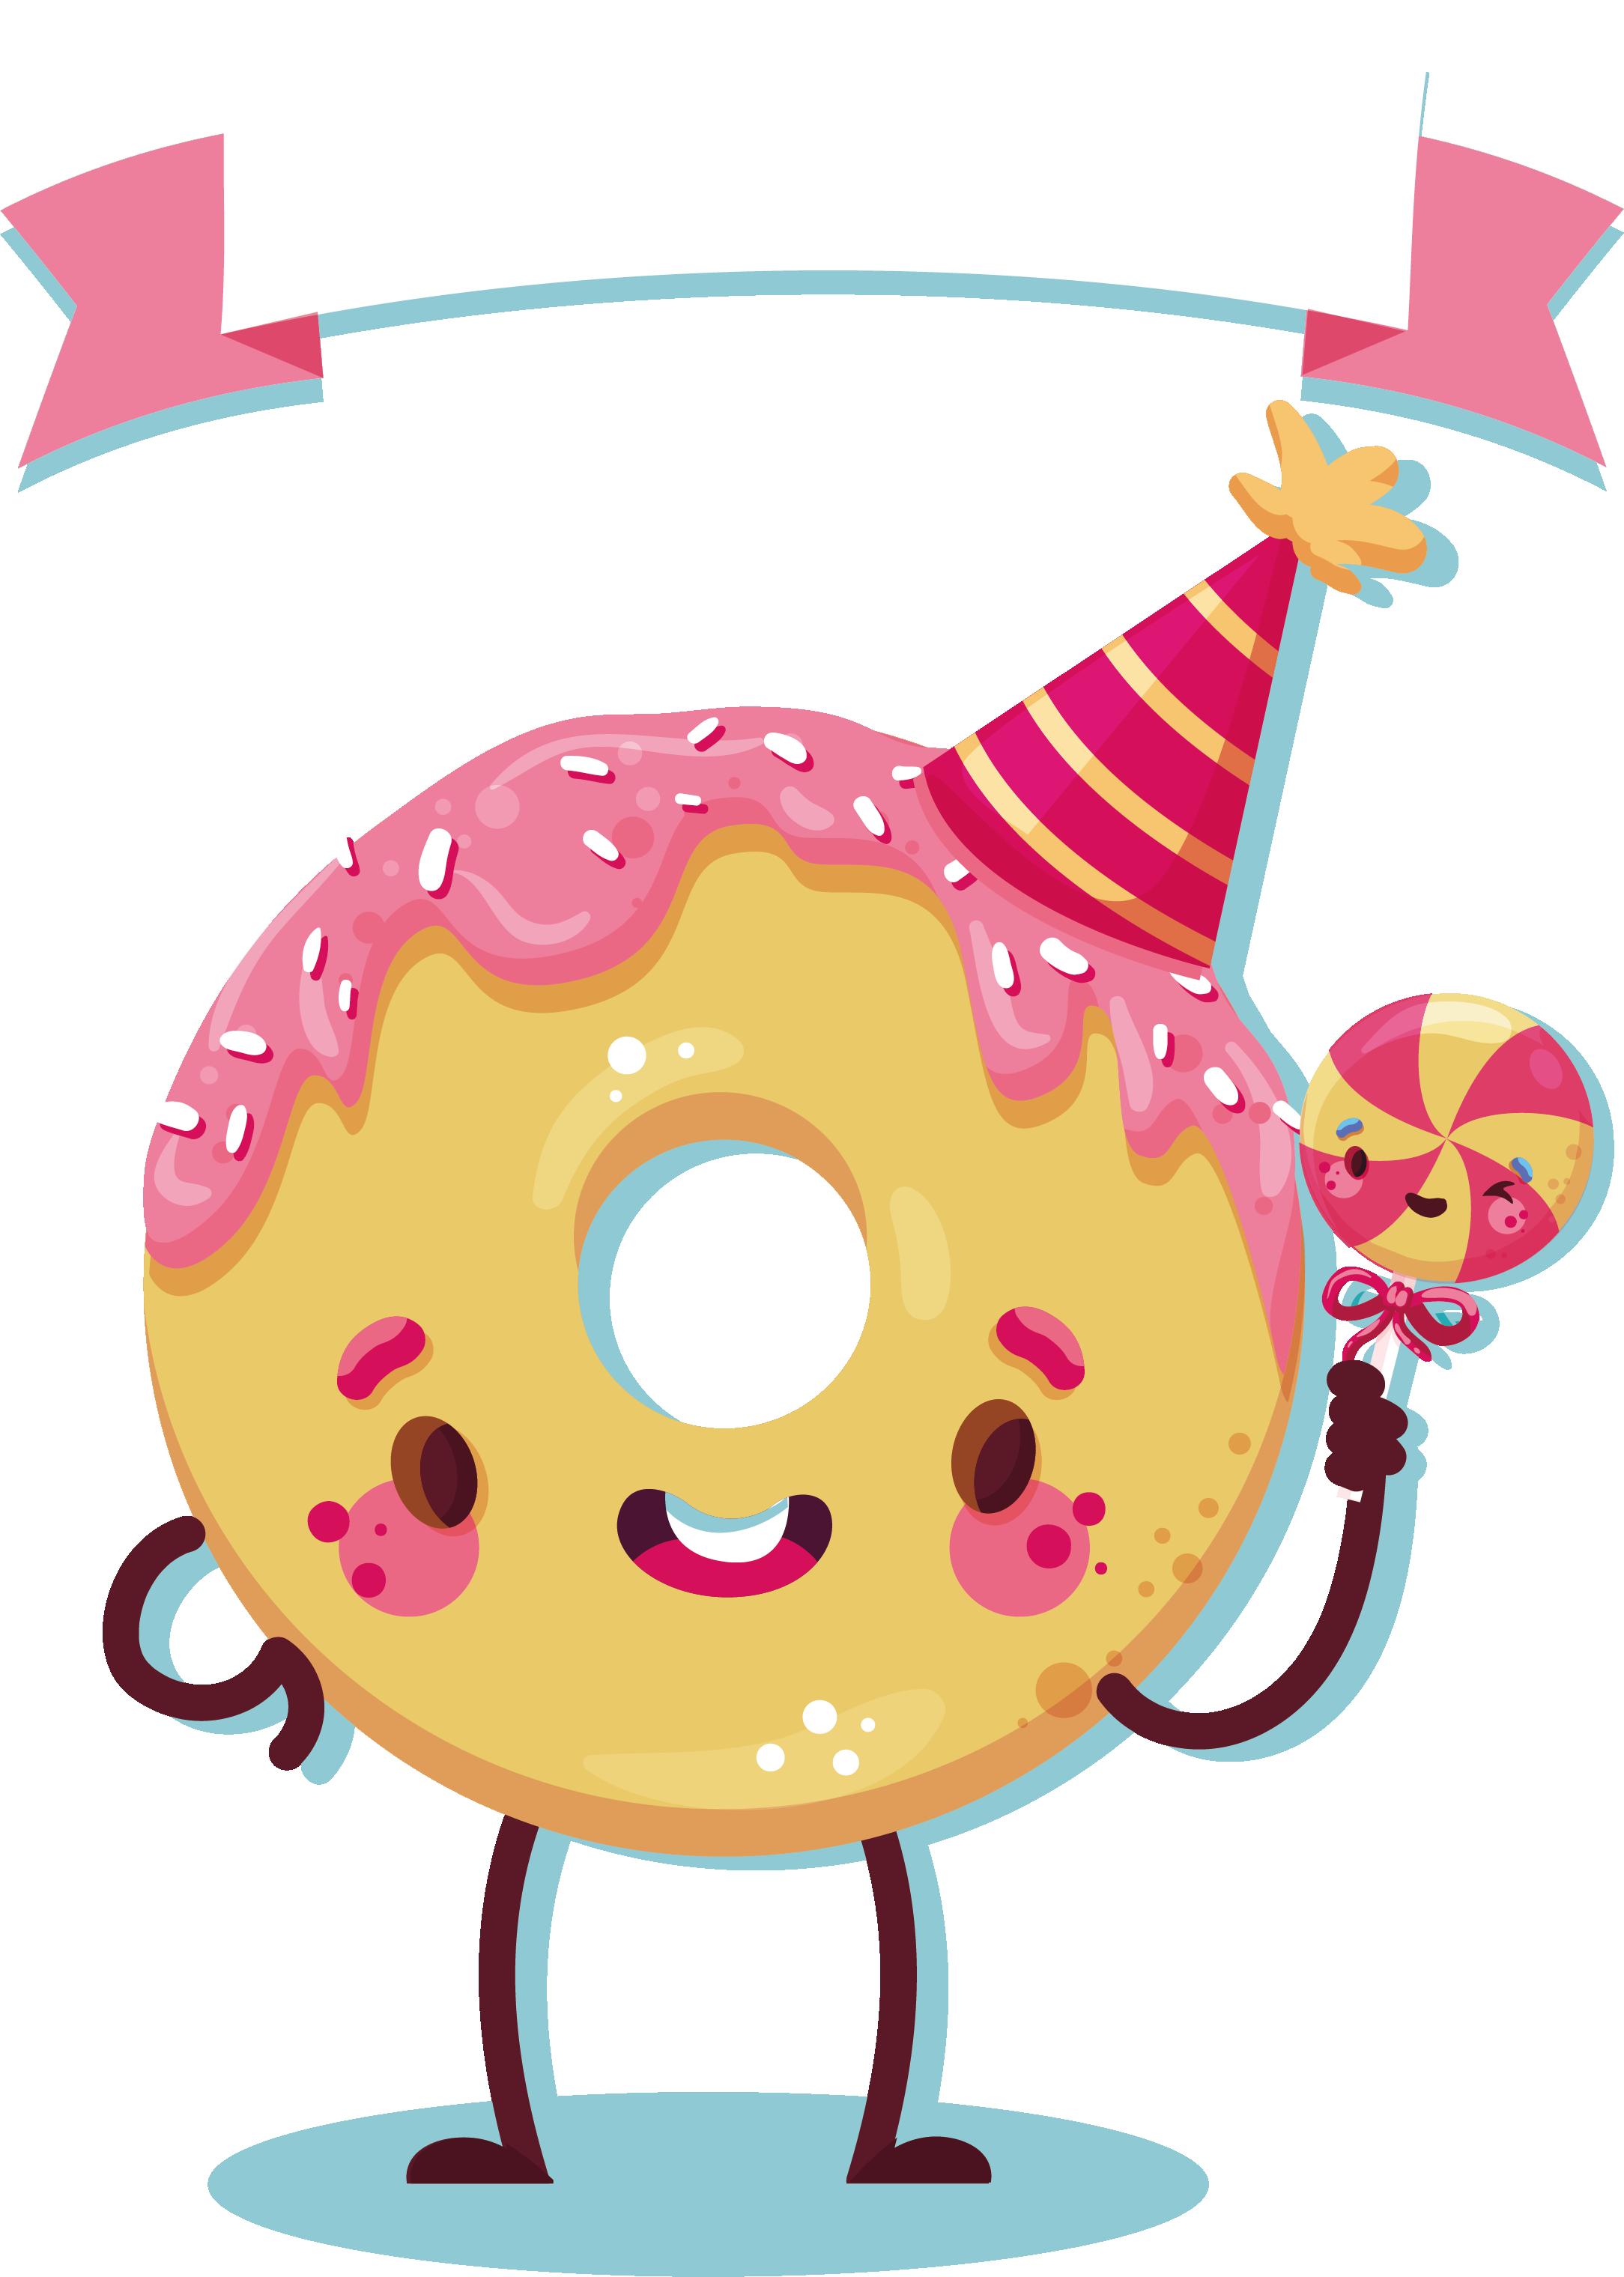 Doughnut cartoon transprent png. Donut clipart yellow